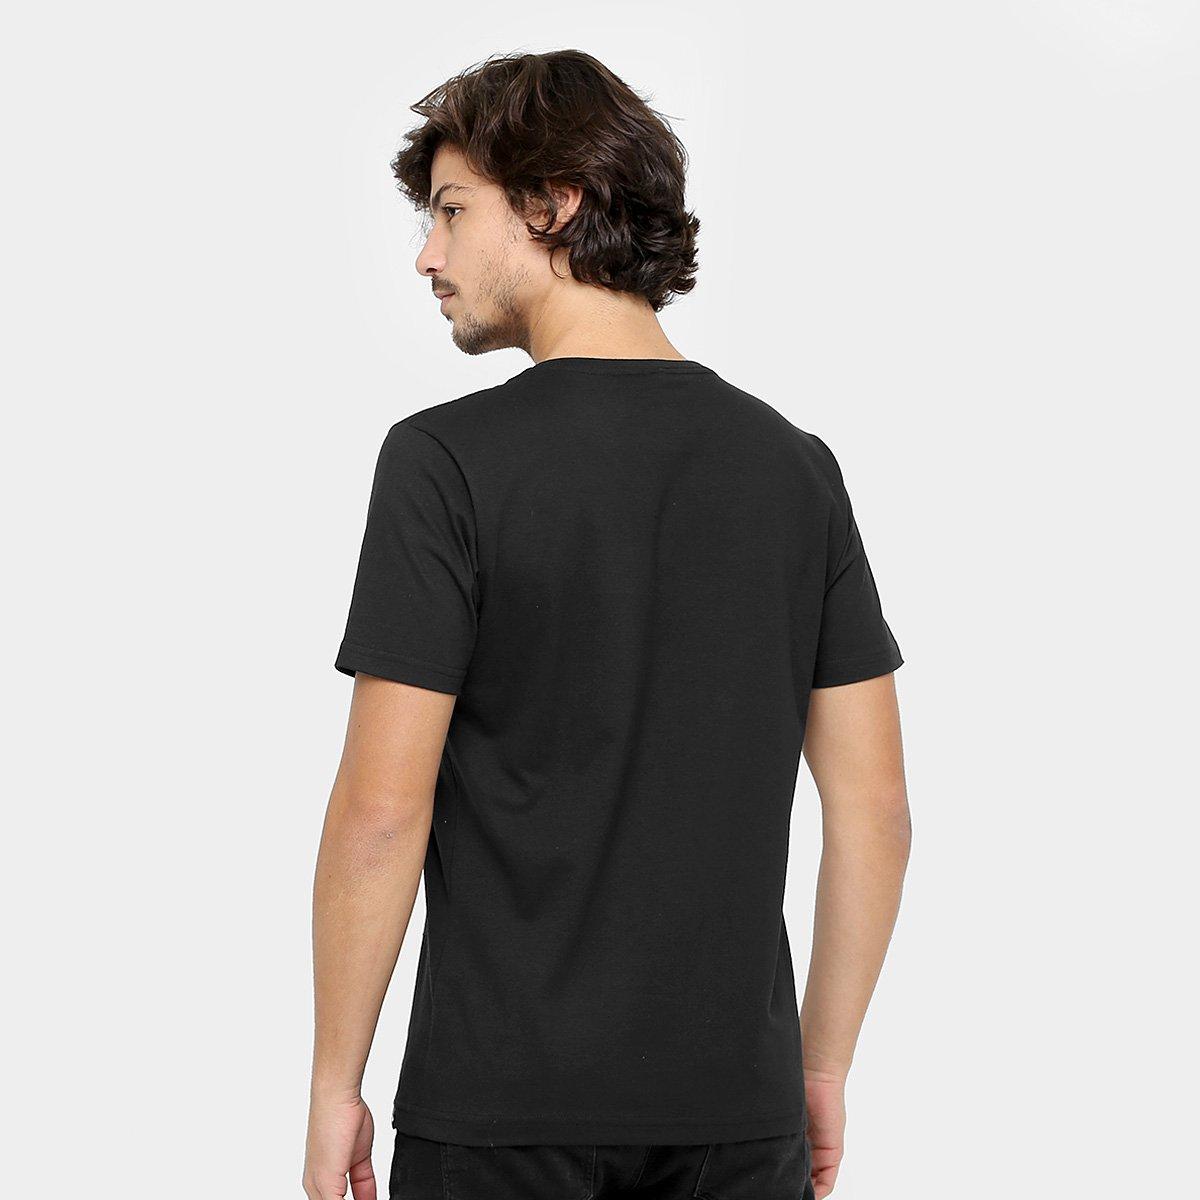 Camiseta Fatal SkateBoard Masculina  Camiseta Fatal SkateBoard Masculina ... ee5d118ca7c